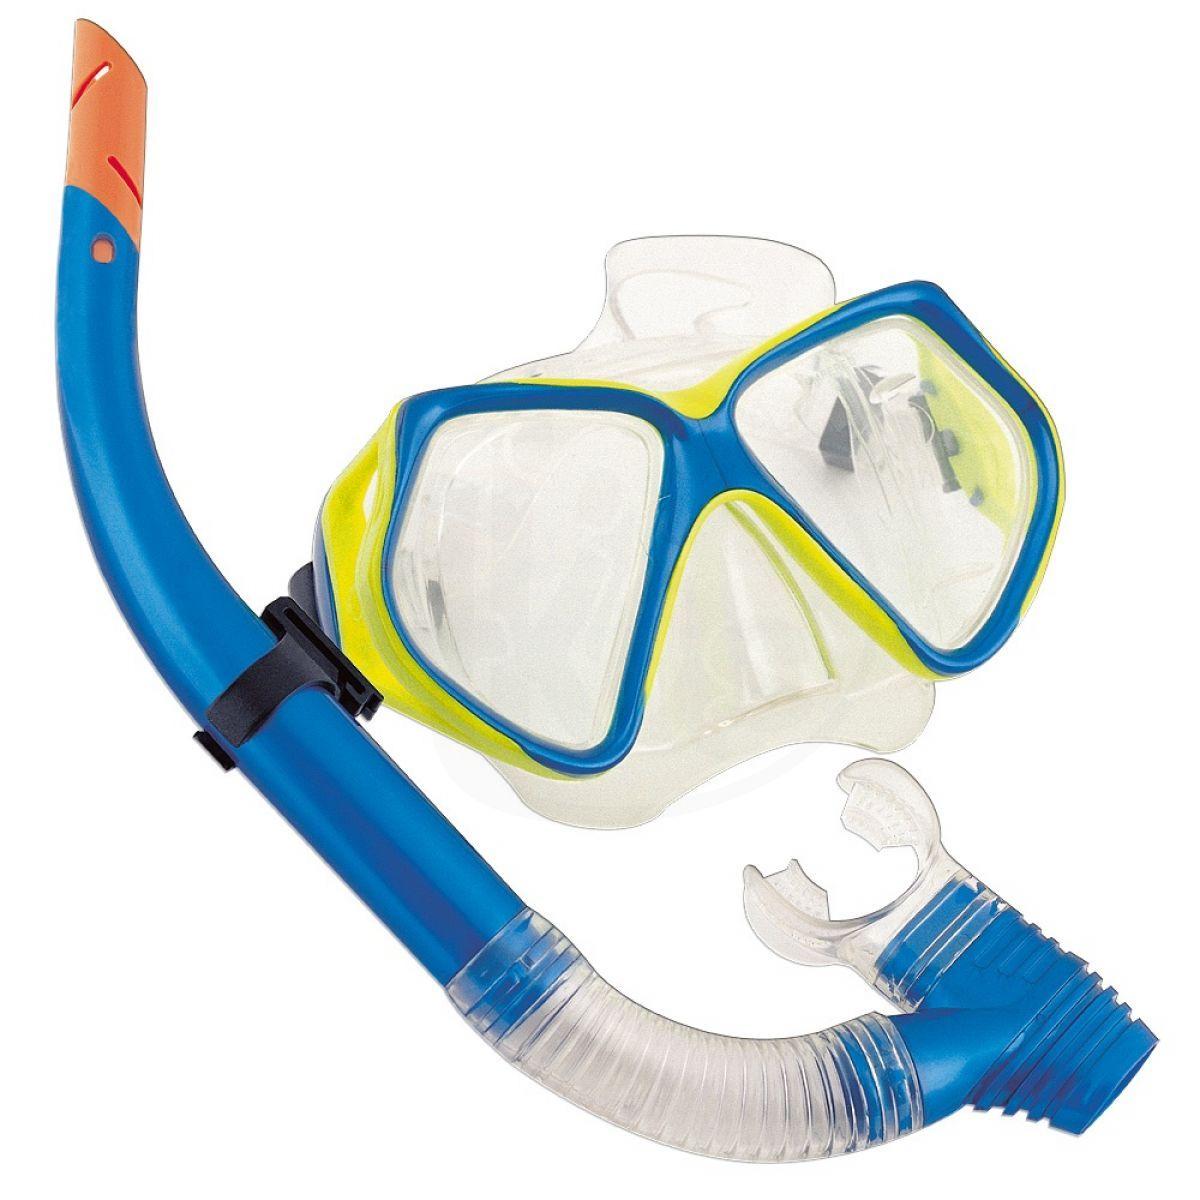 Bestway Potápěčský set - Modrá